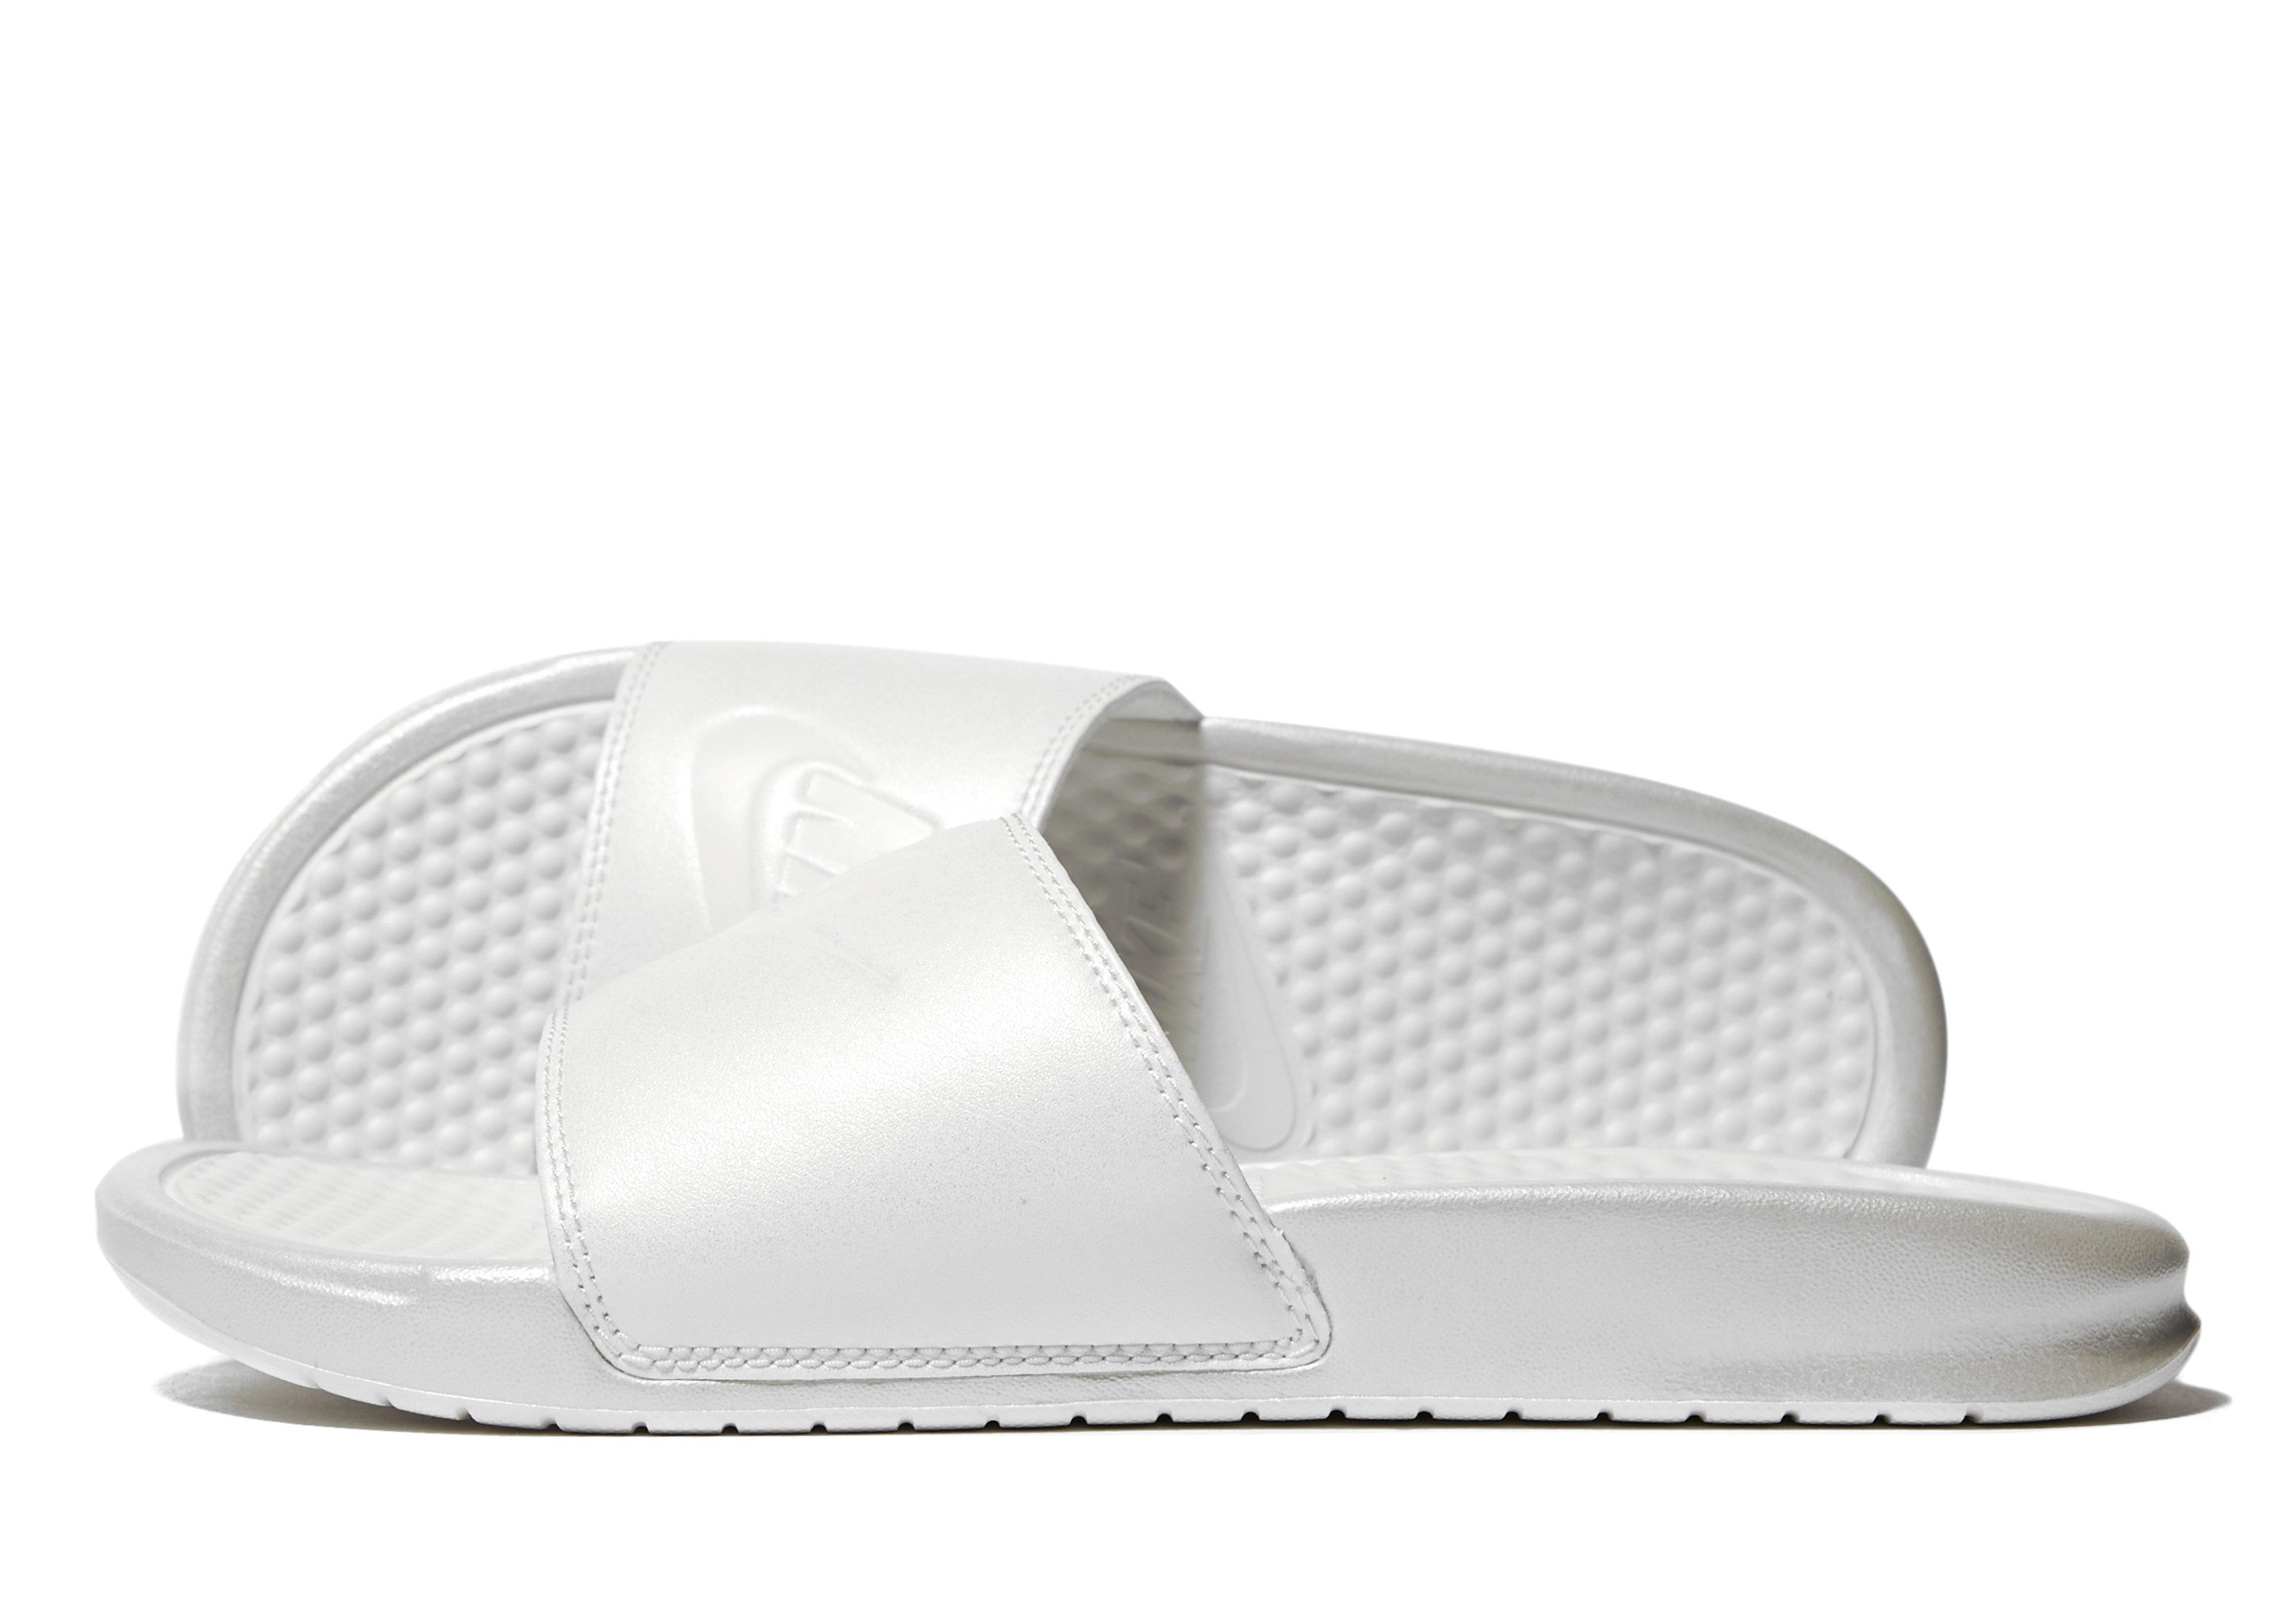 d8a7ddde2daa5d Lyst - Nike Benassi Slides in White